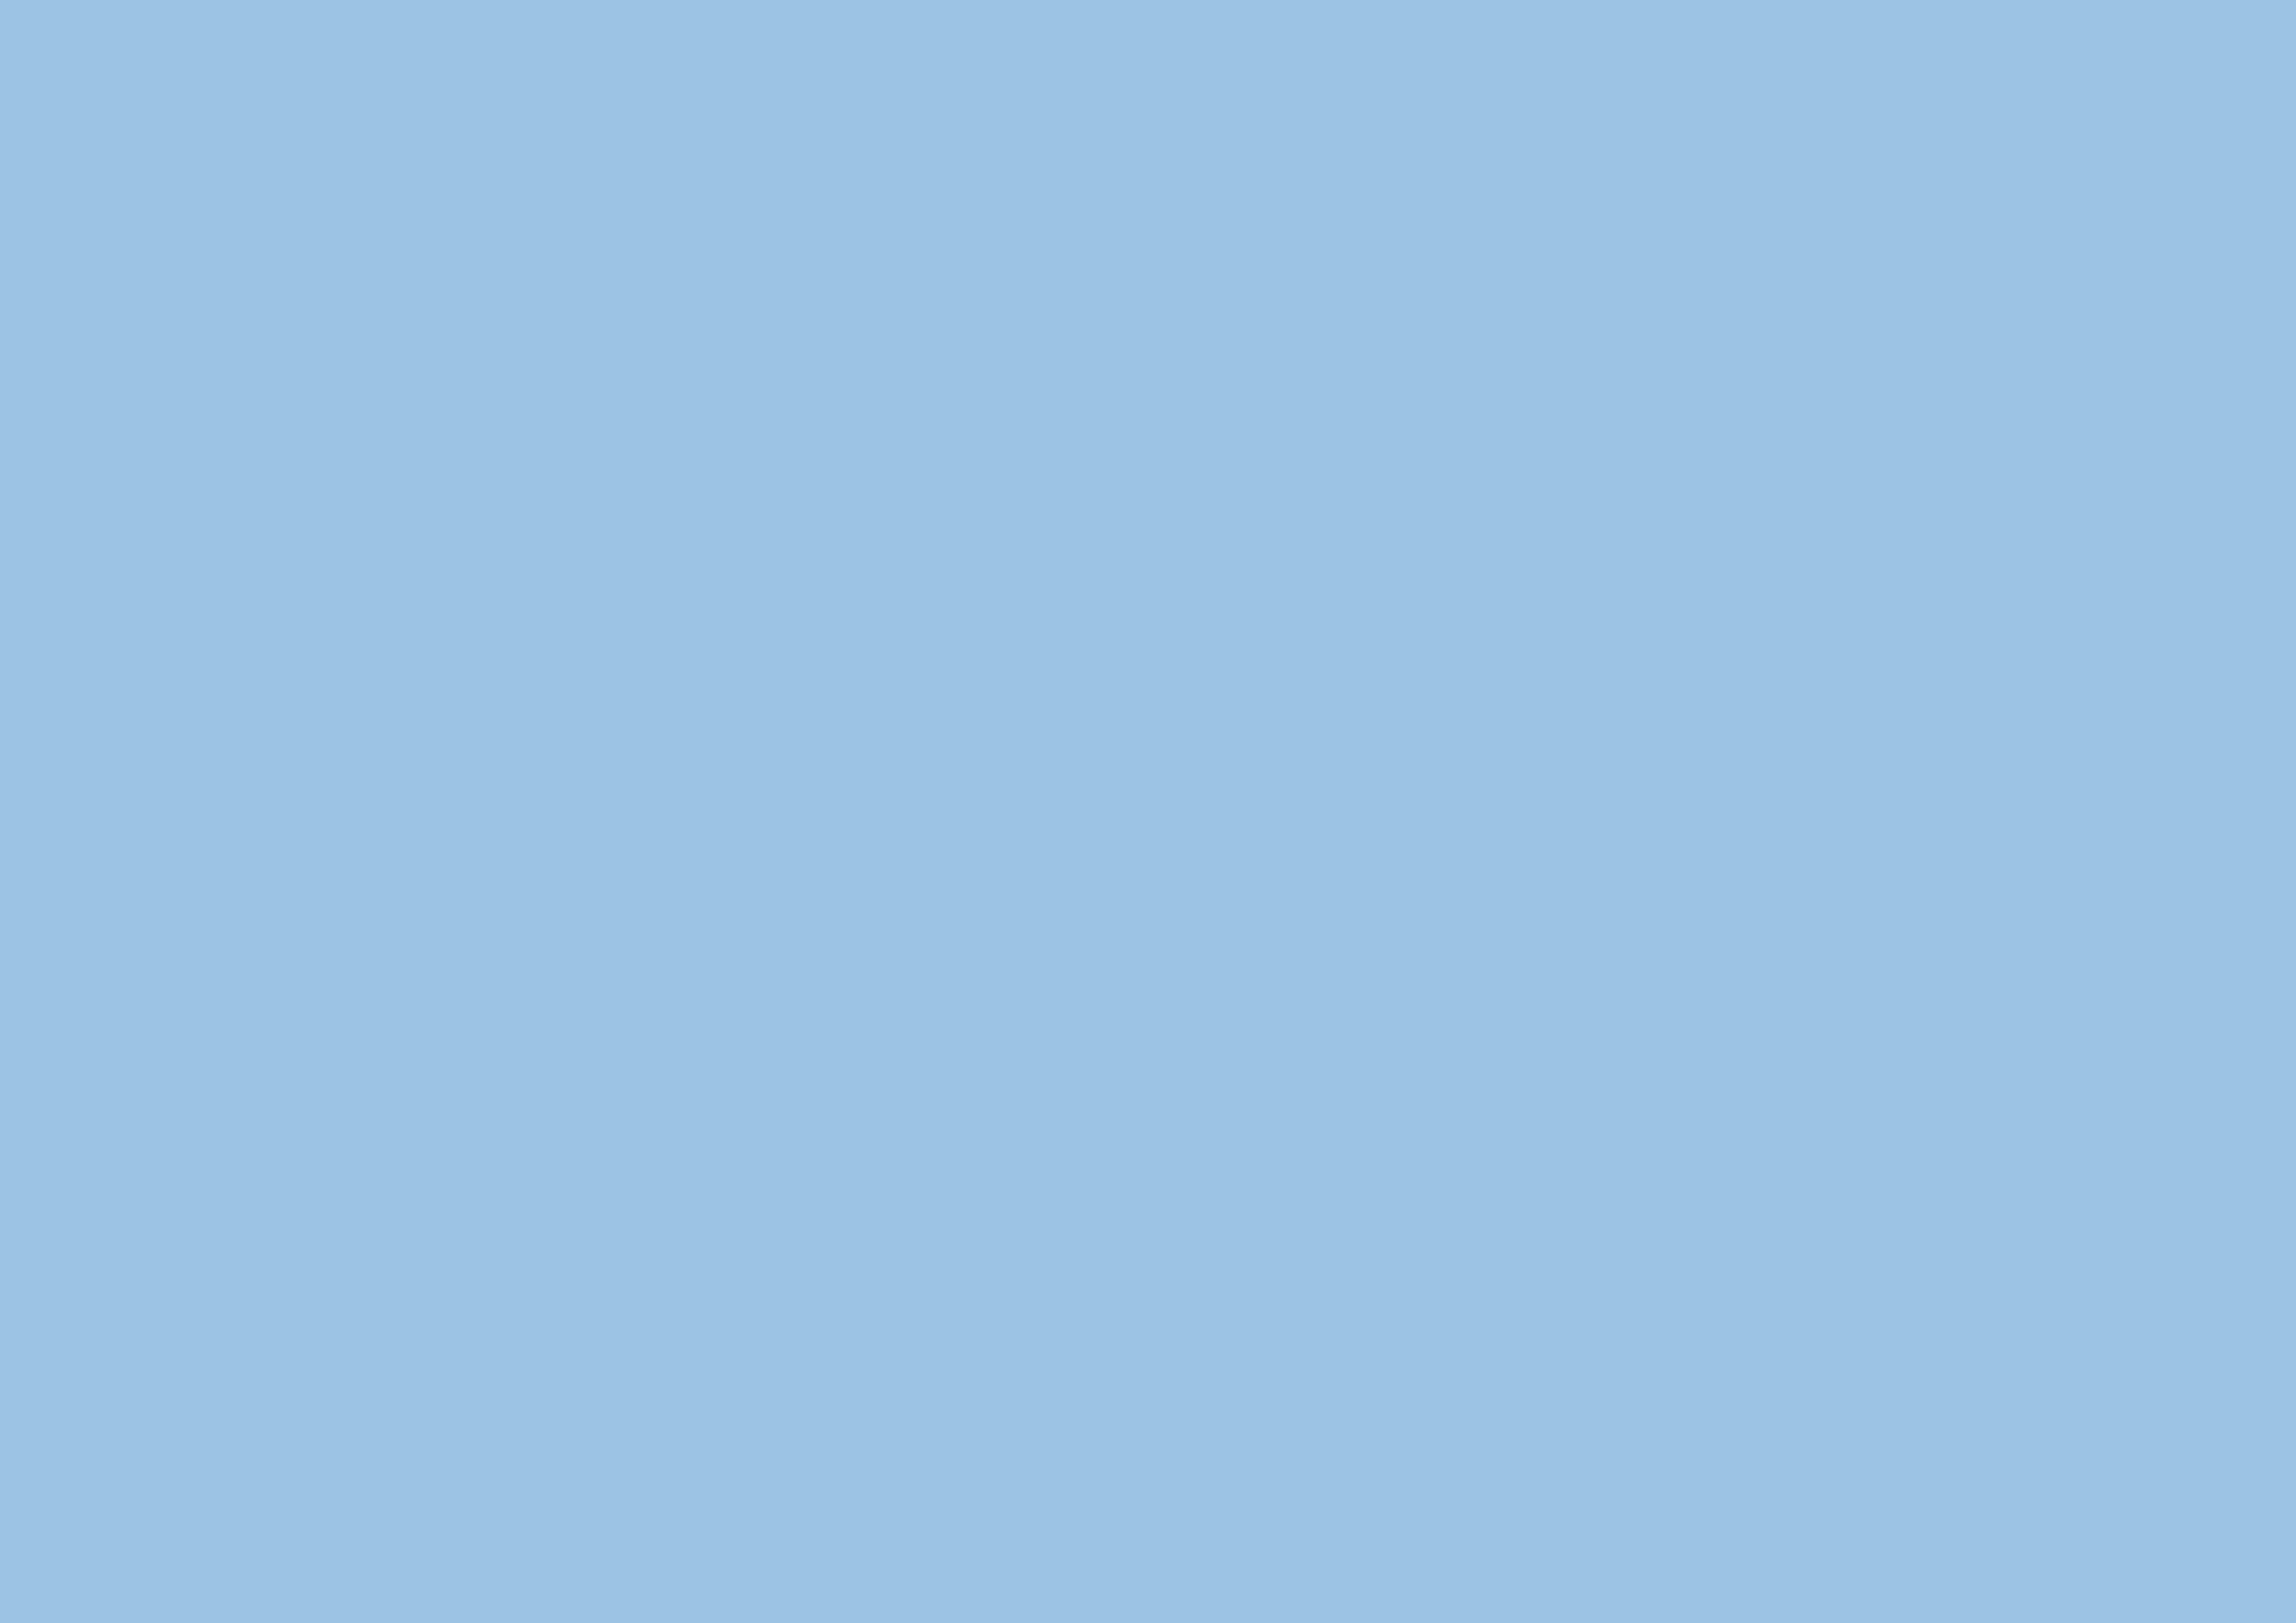 3508x2480 Pale Cerulean Solid Color Background